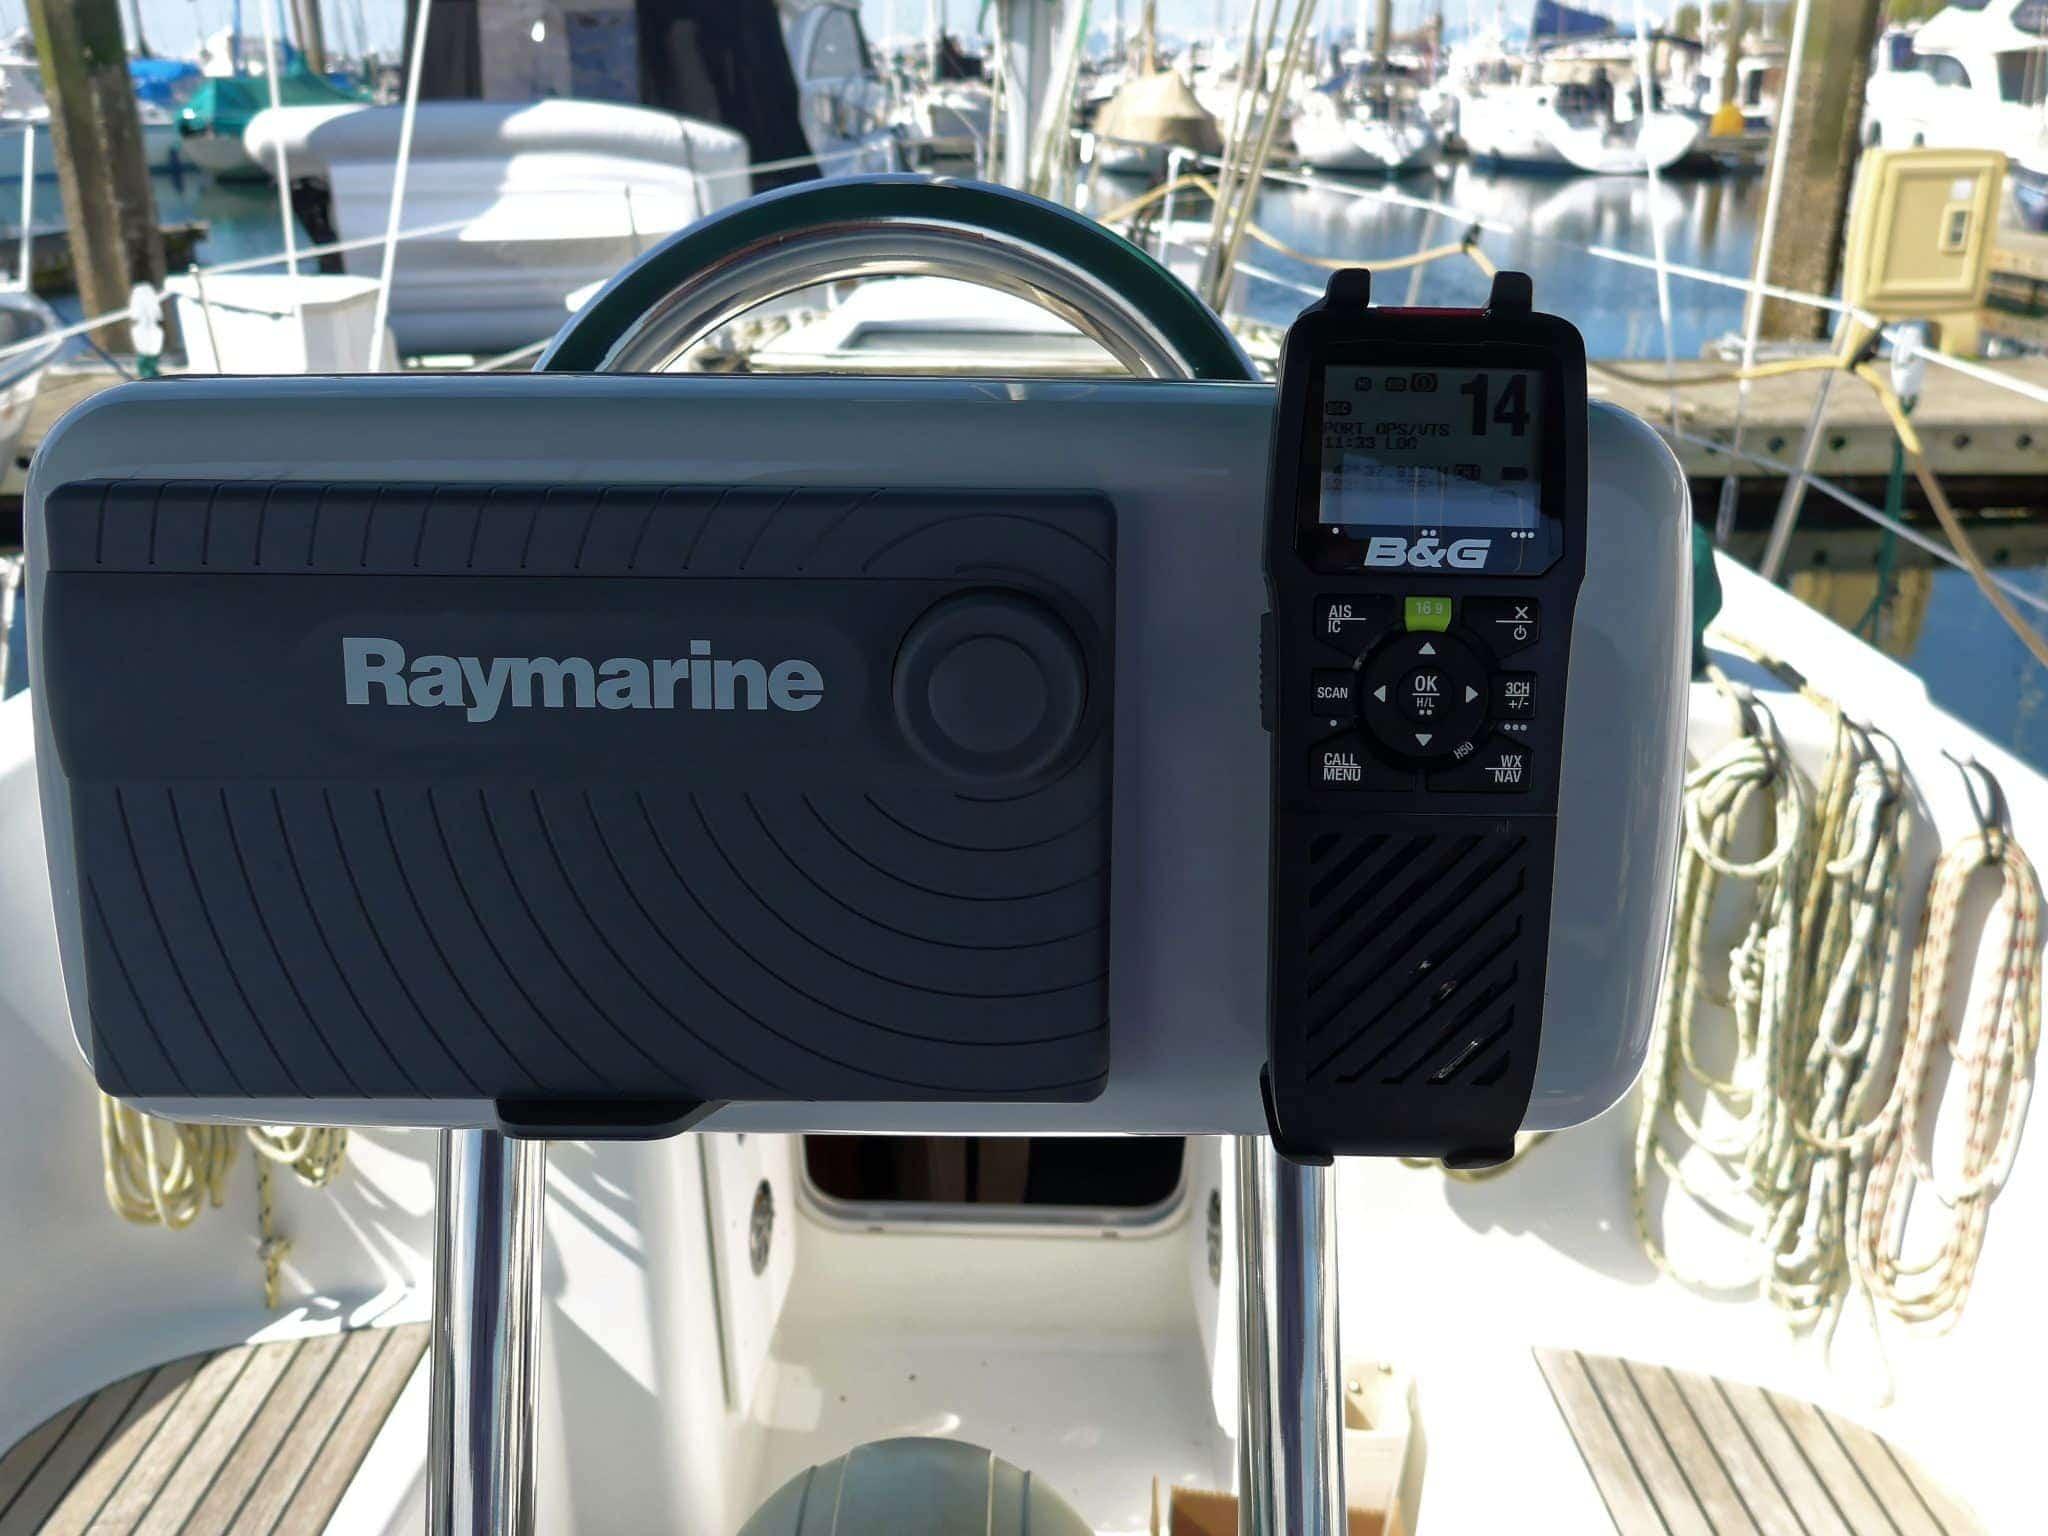 B&G H50 wireless VHF handset mounted on NavPod near Raymarine eS78